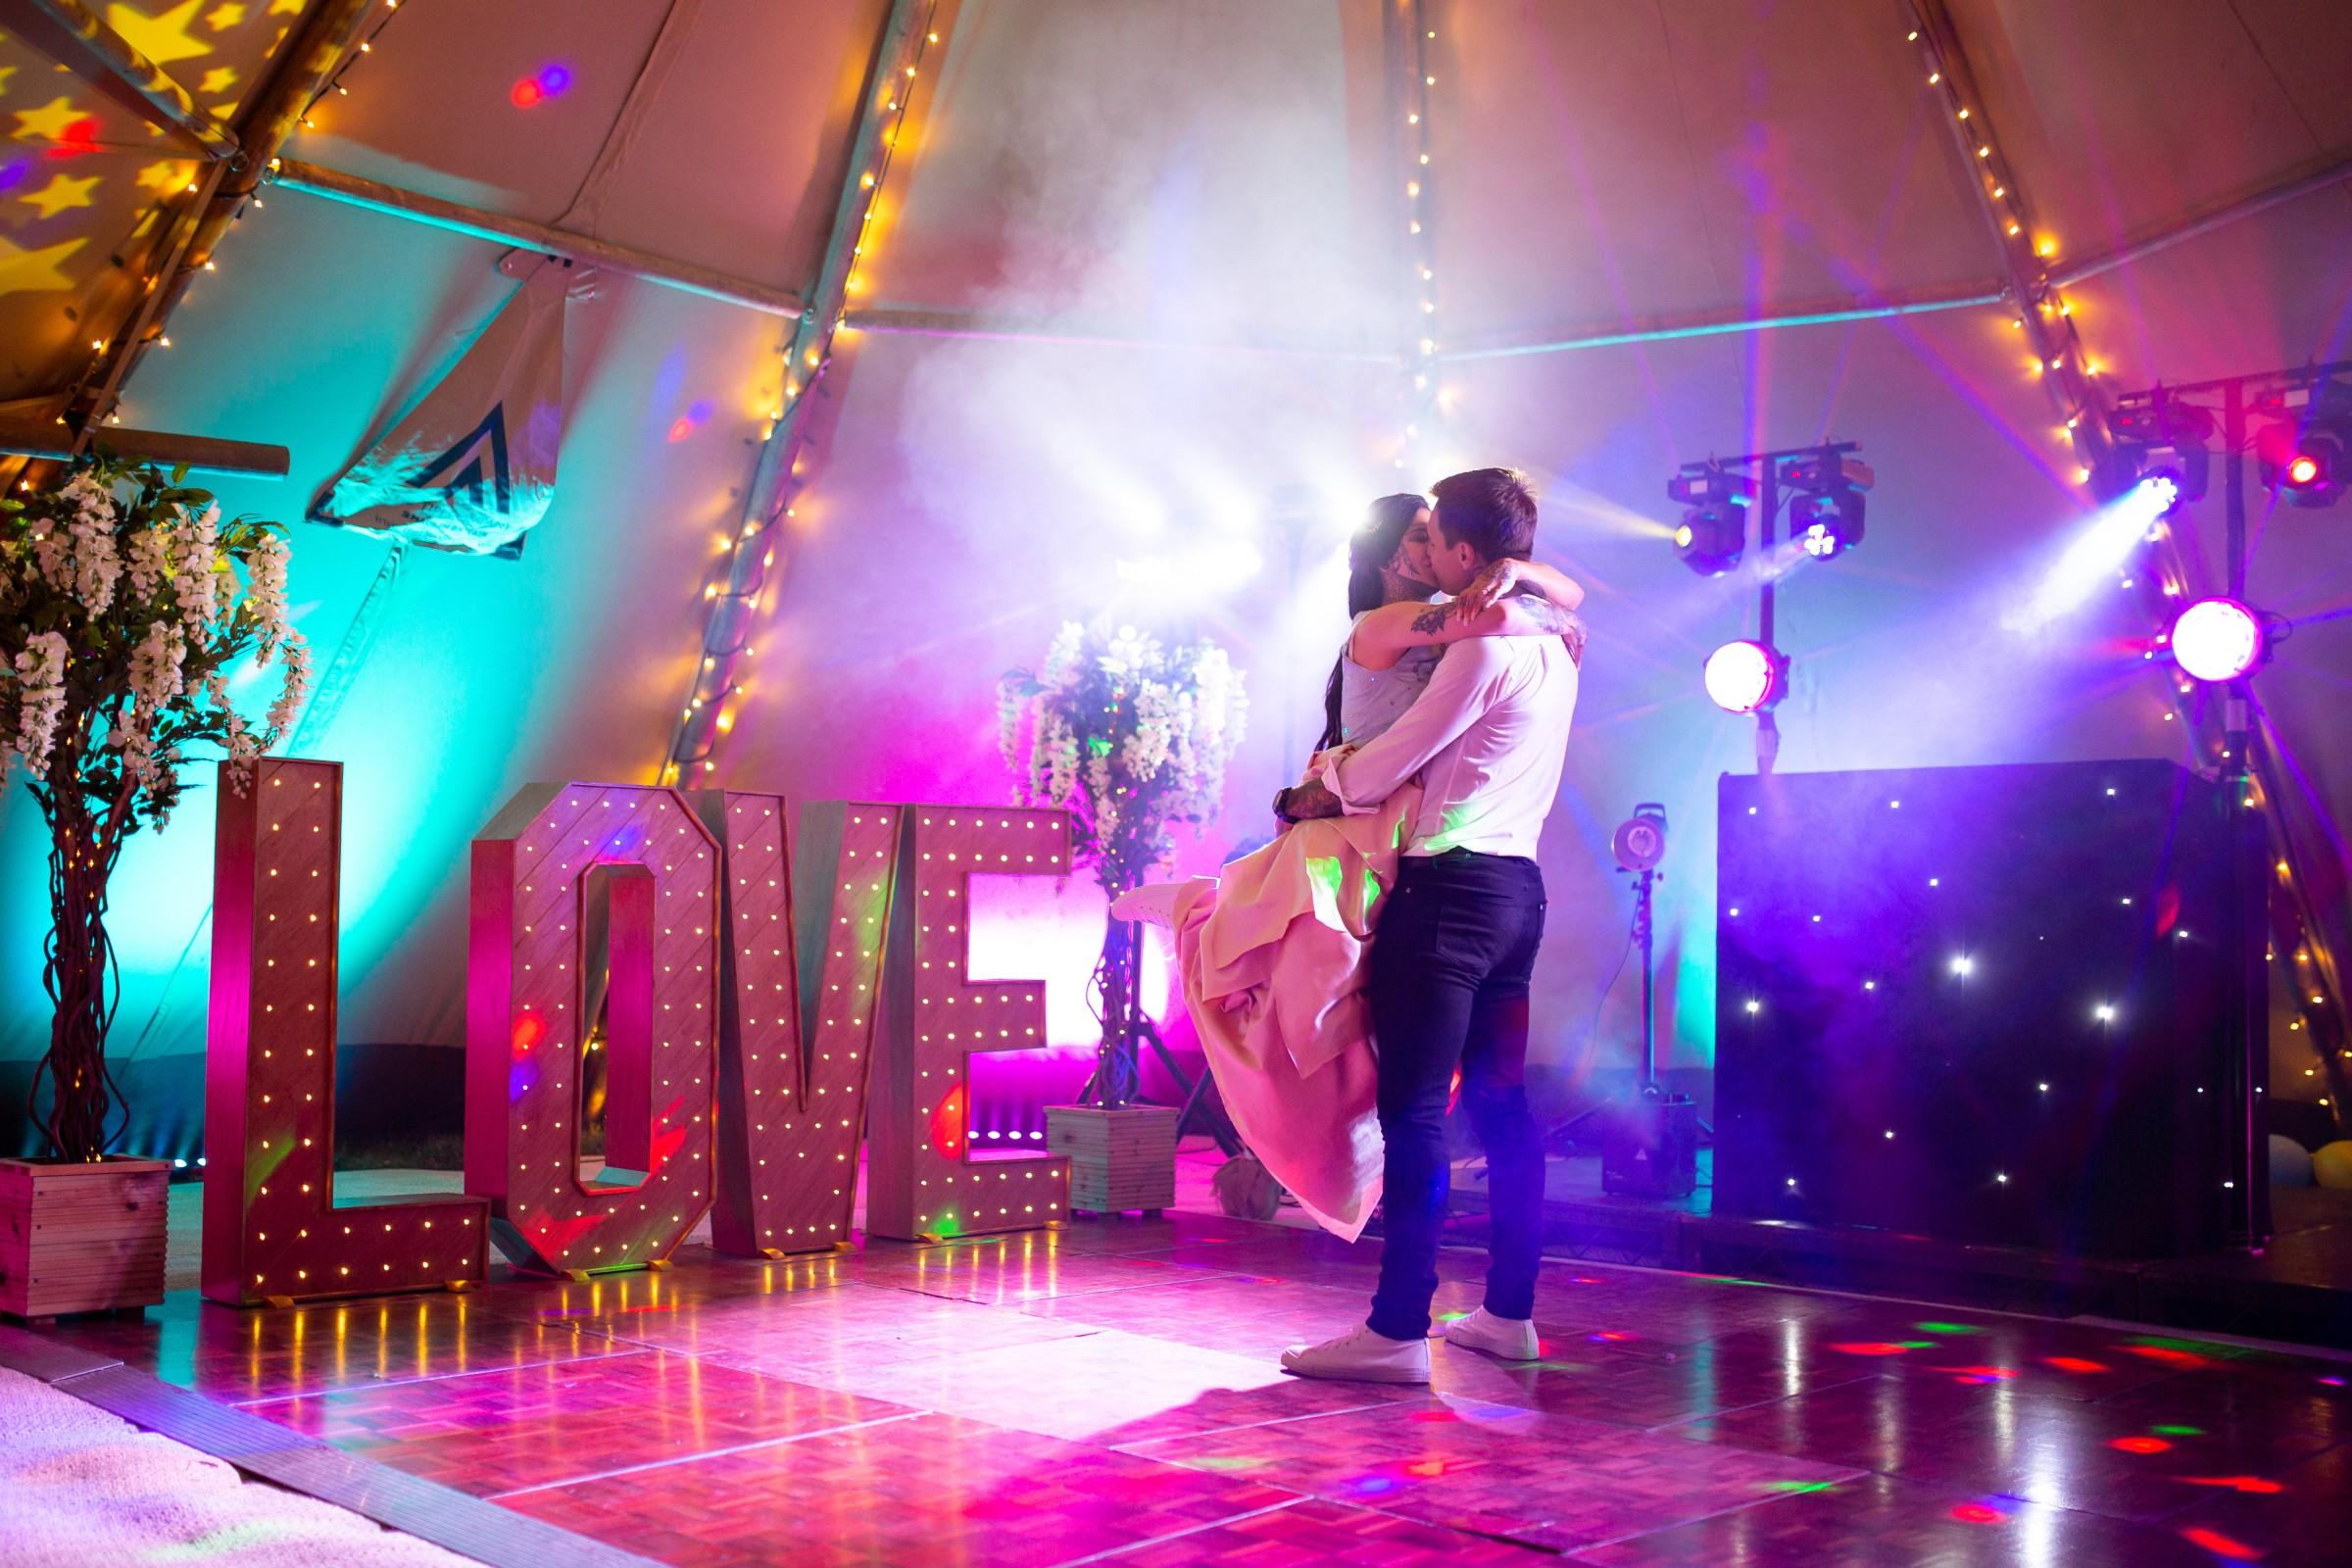 rainbow festival wedding - colourful wedding - quirky wedding ideas - neon love sign - bride and groom kiss on the dancefloor